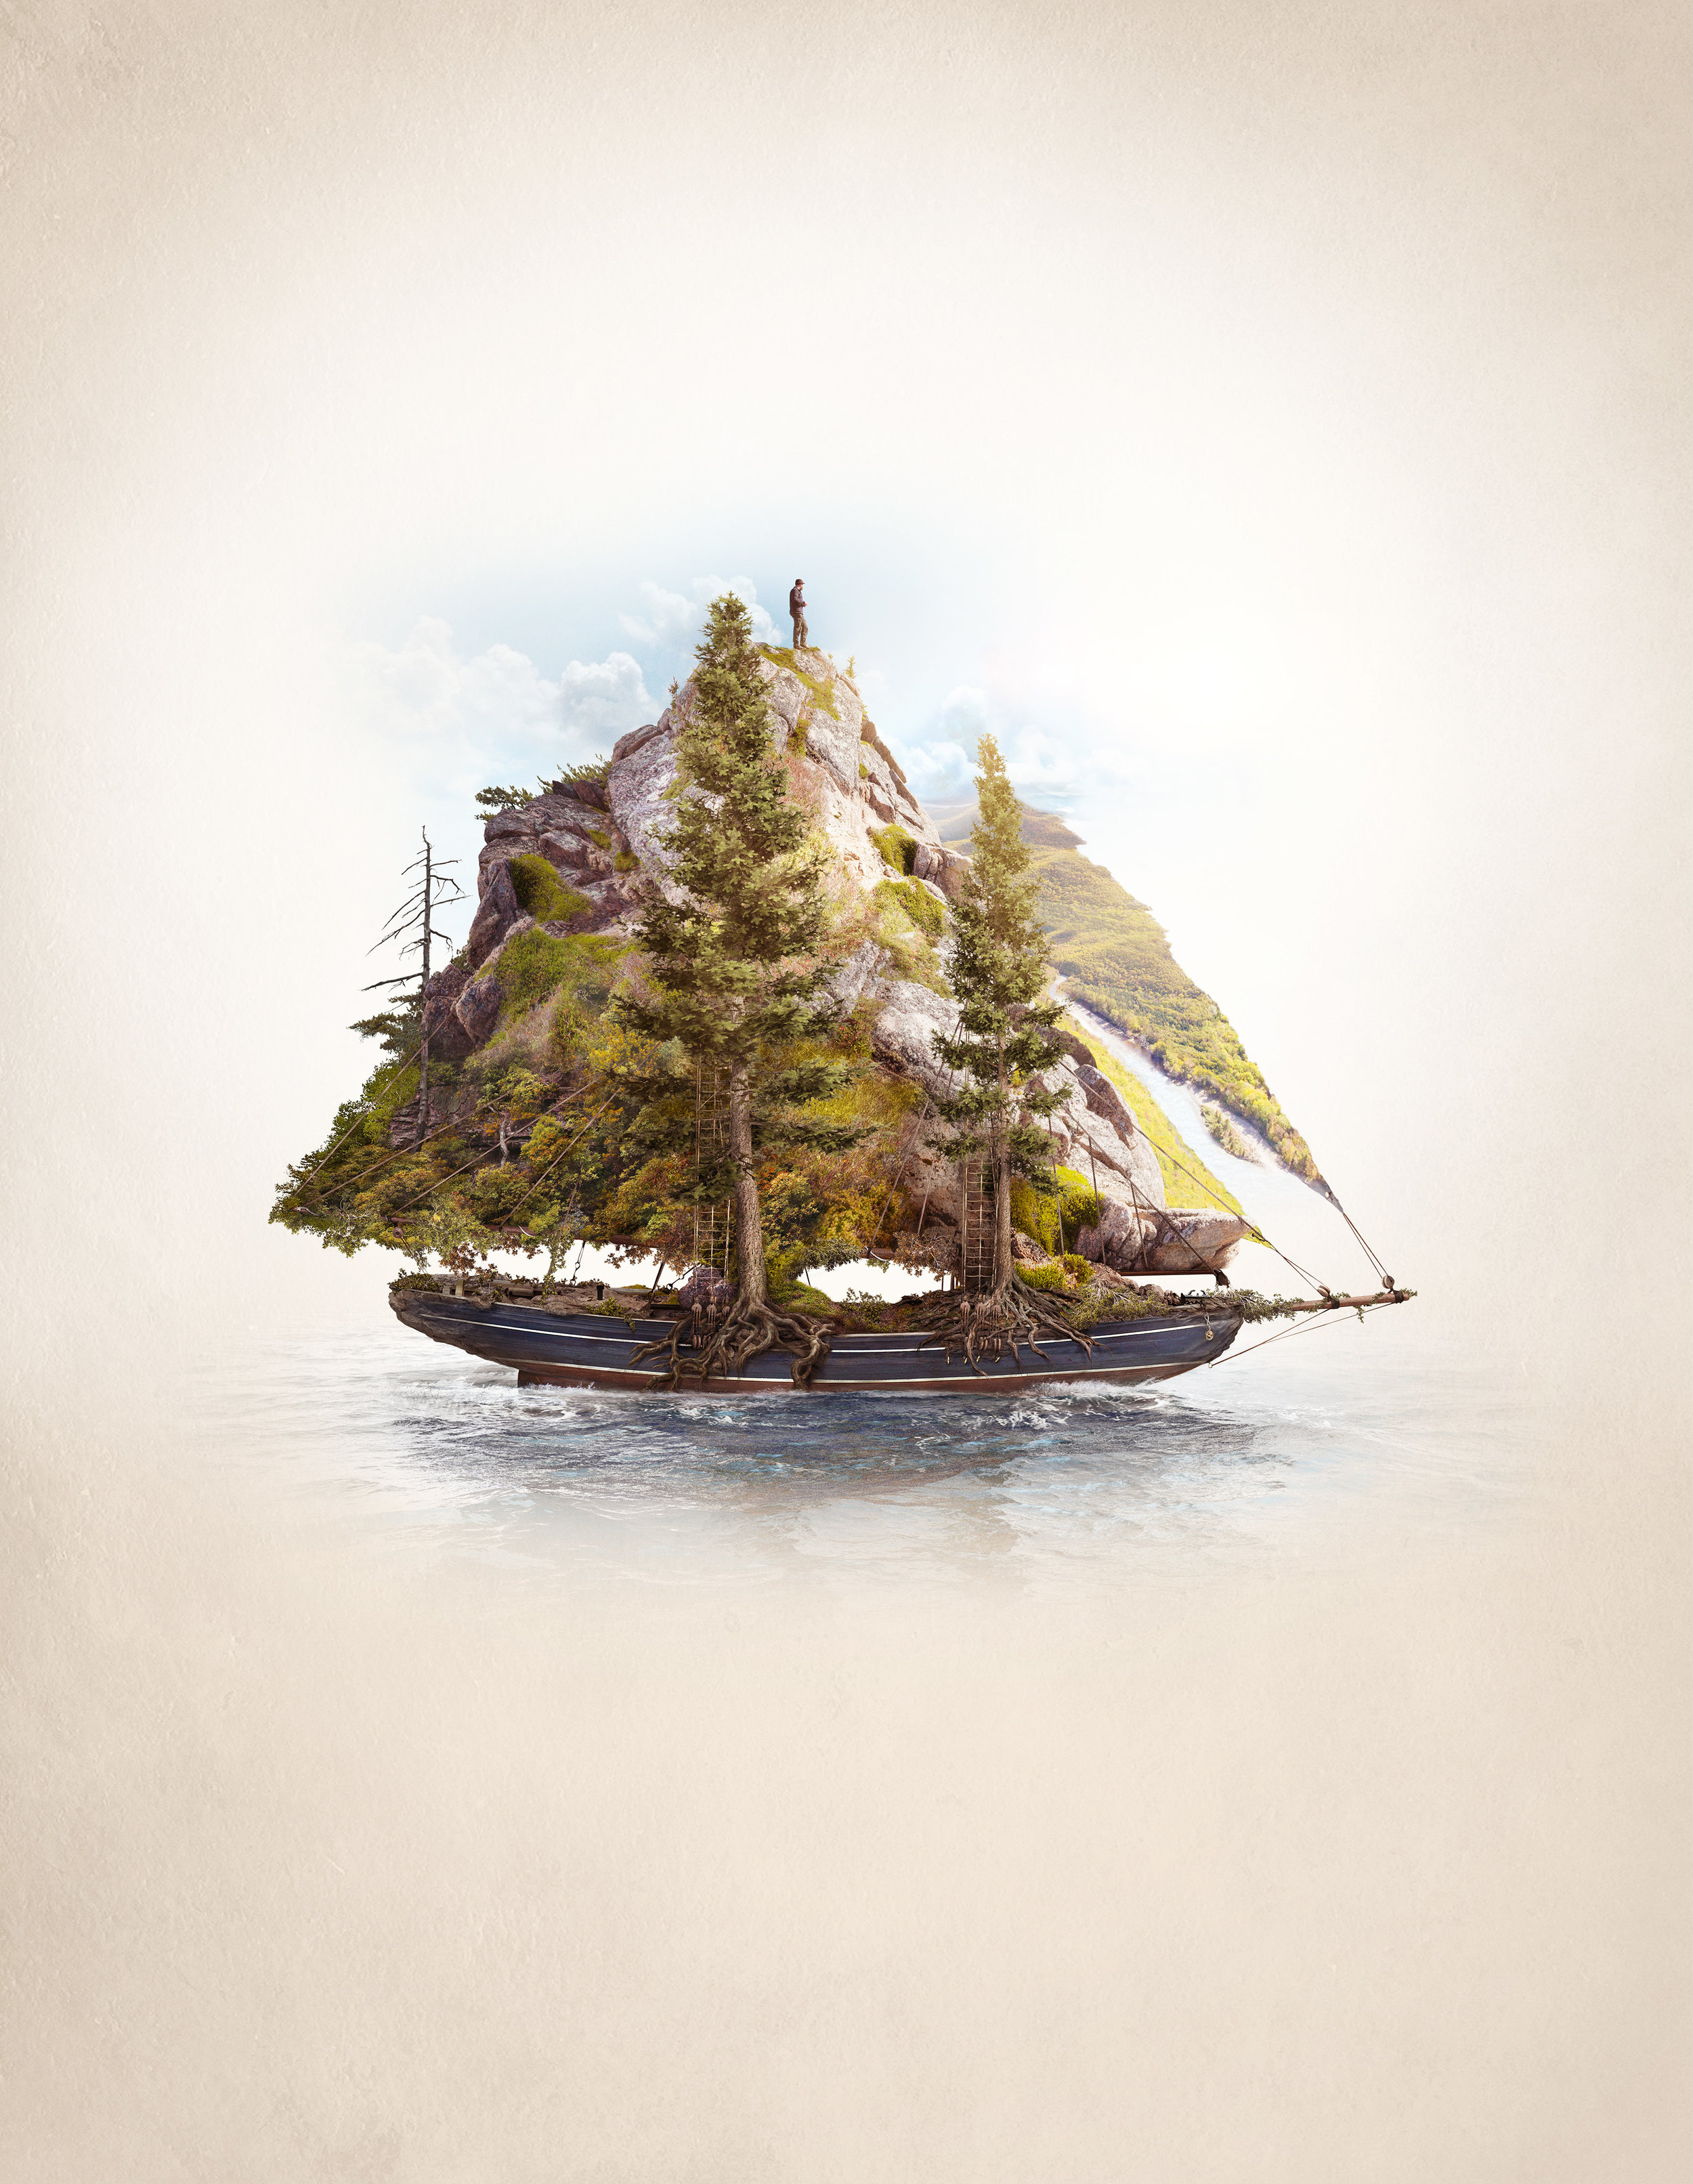 CGI exploration